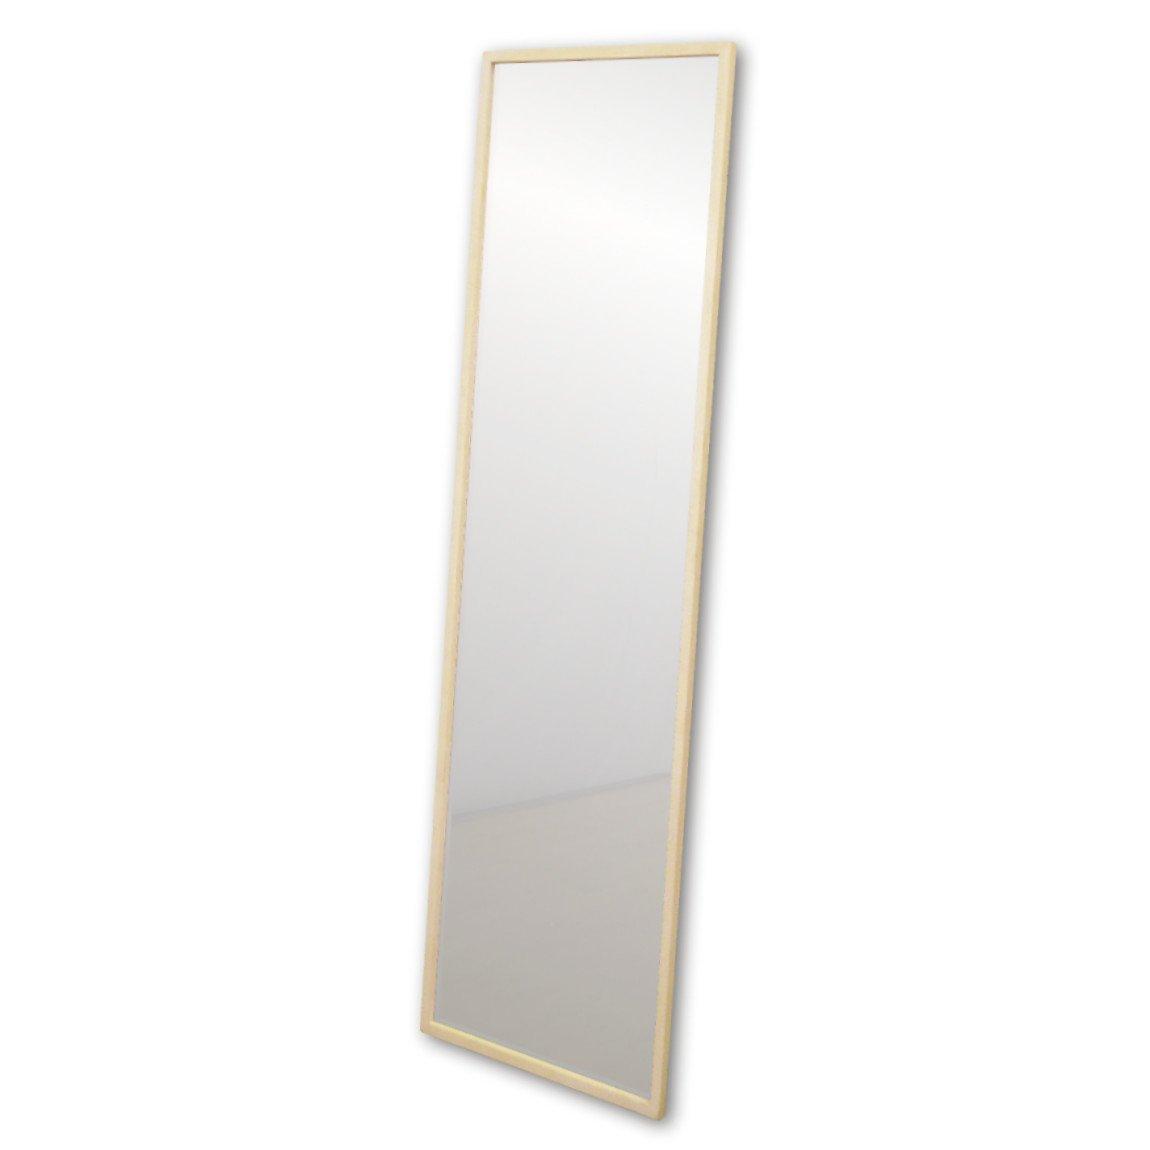 NaturalHouse 日本製 ミラー 鏡 アンティーク ウォールミラー 木製 フレーム ( 幅 43.6 cm 奥行 2 cm 高さ 148 cm ) 飛散防止 (Wh ホワイト) B074V4S9V7Wh ホワイト